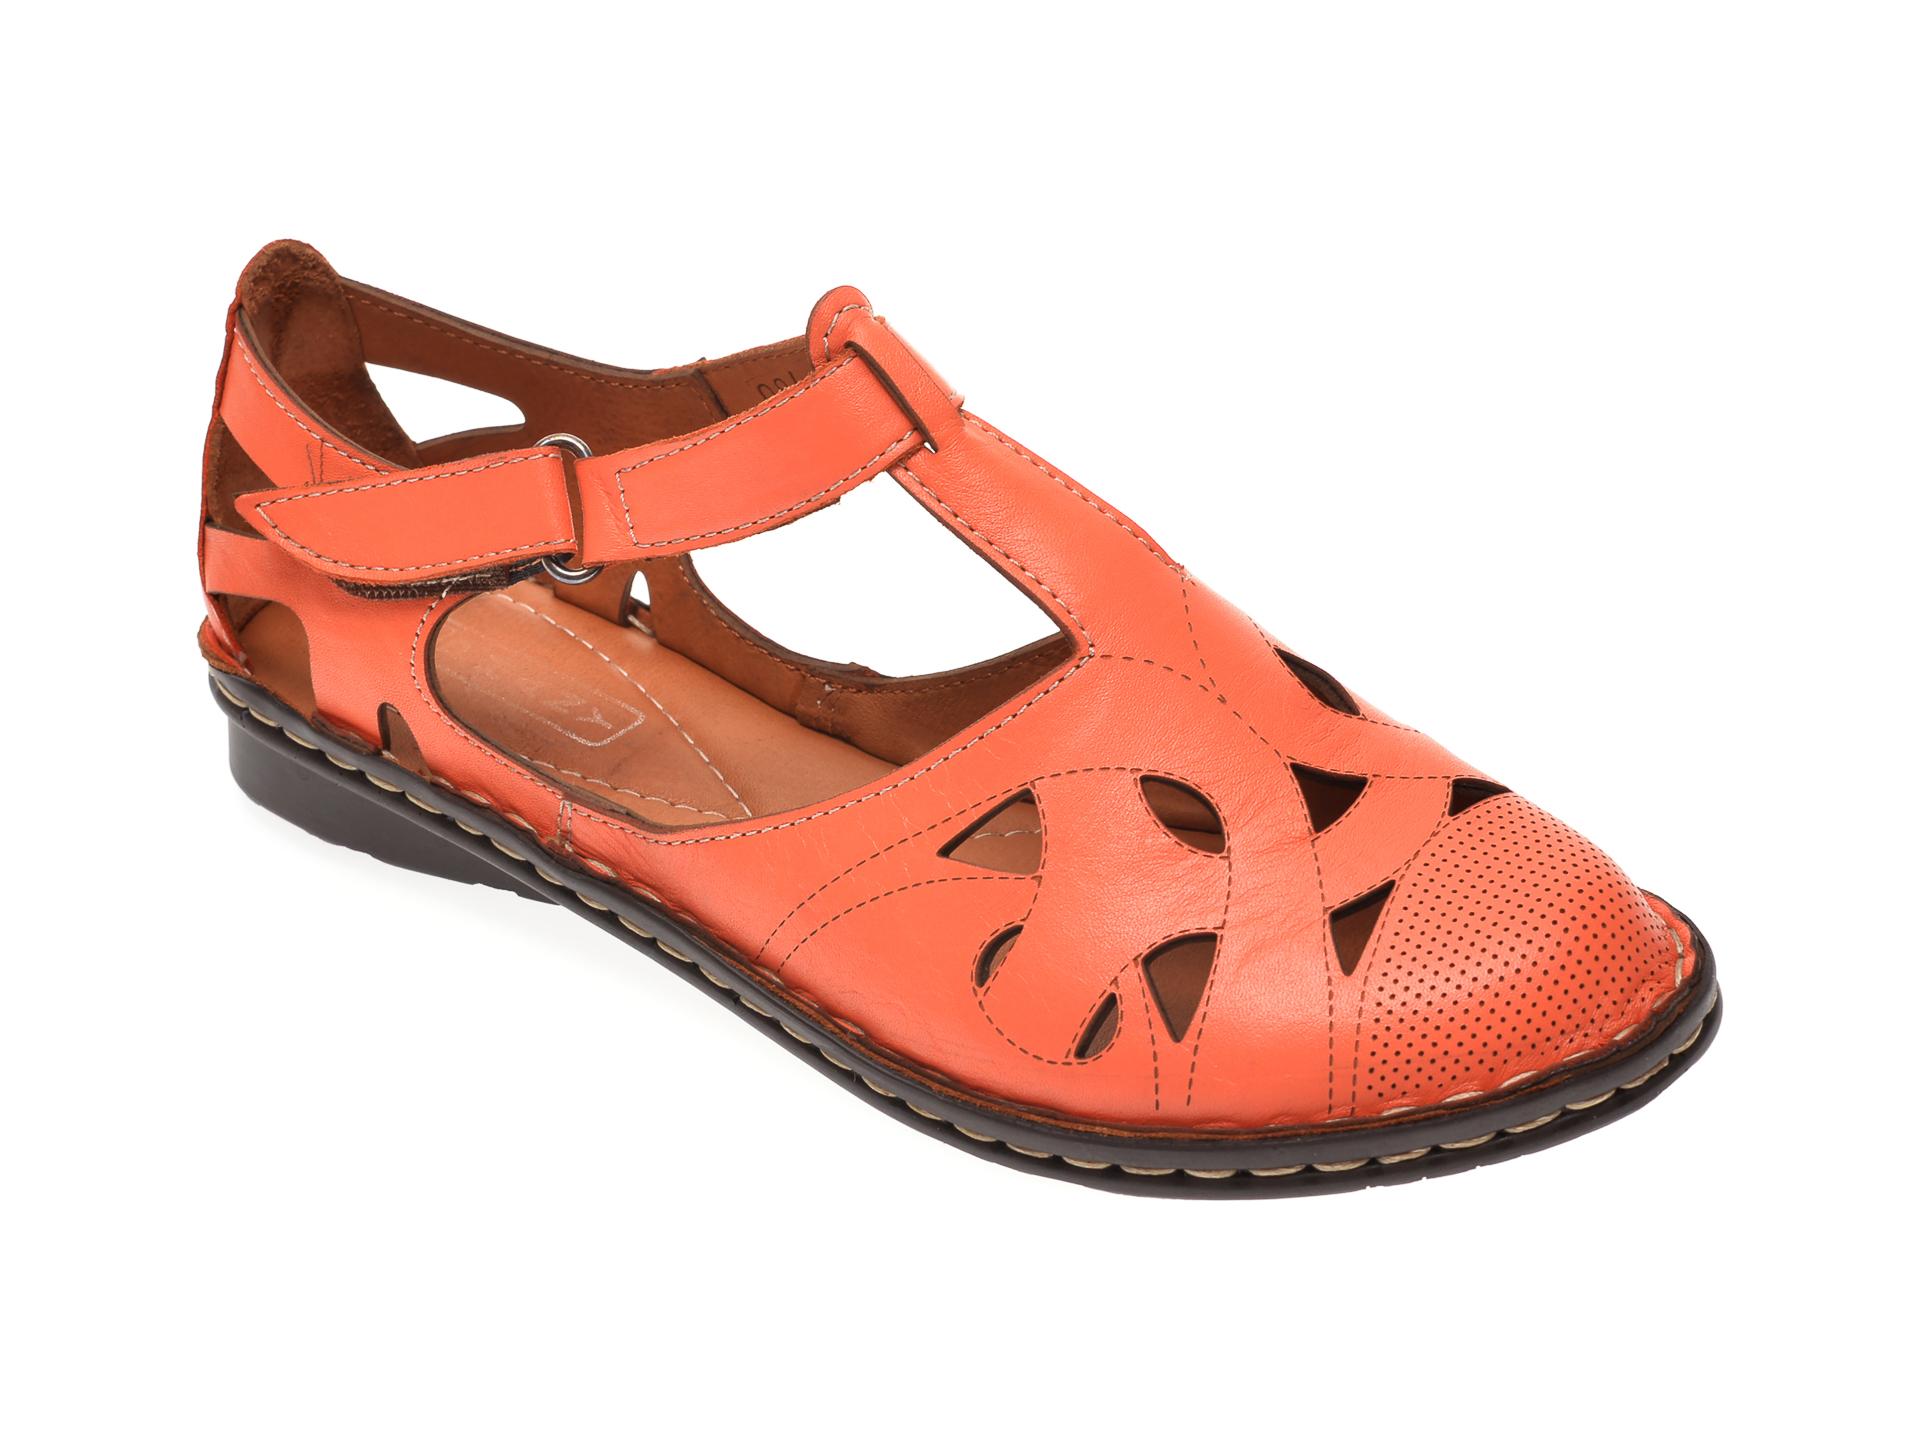 Pantofi GRAND MODA portocalii, 21451, din piele naturala